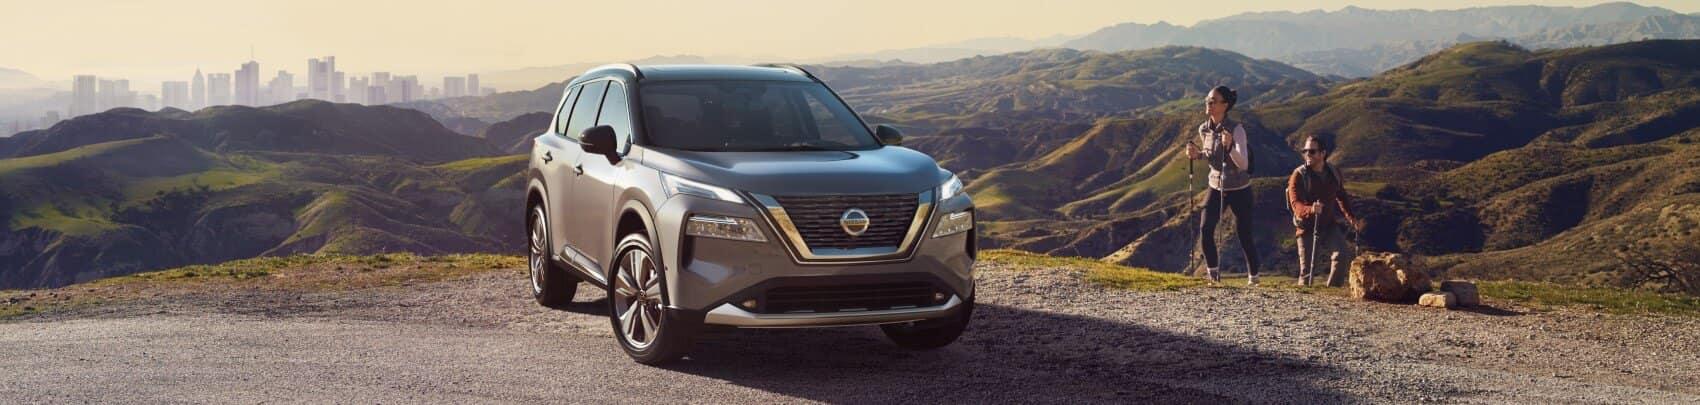 Nissan Rogue for Sale near Prichard AL